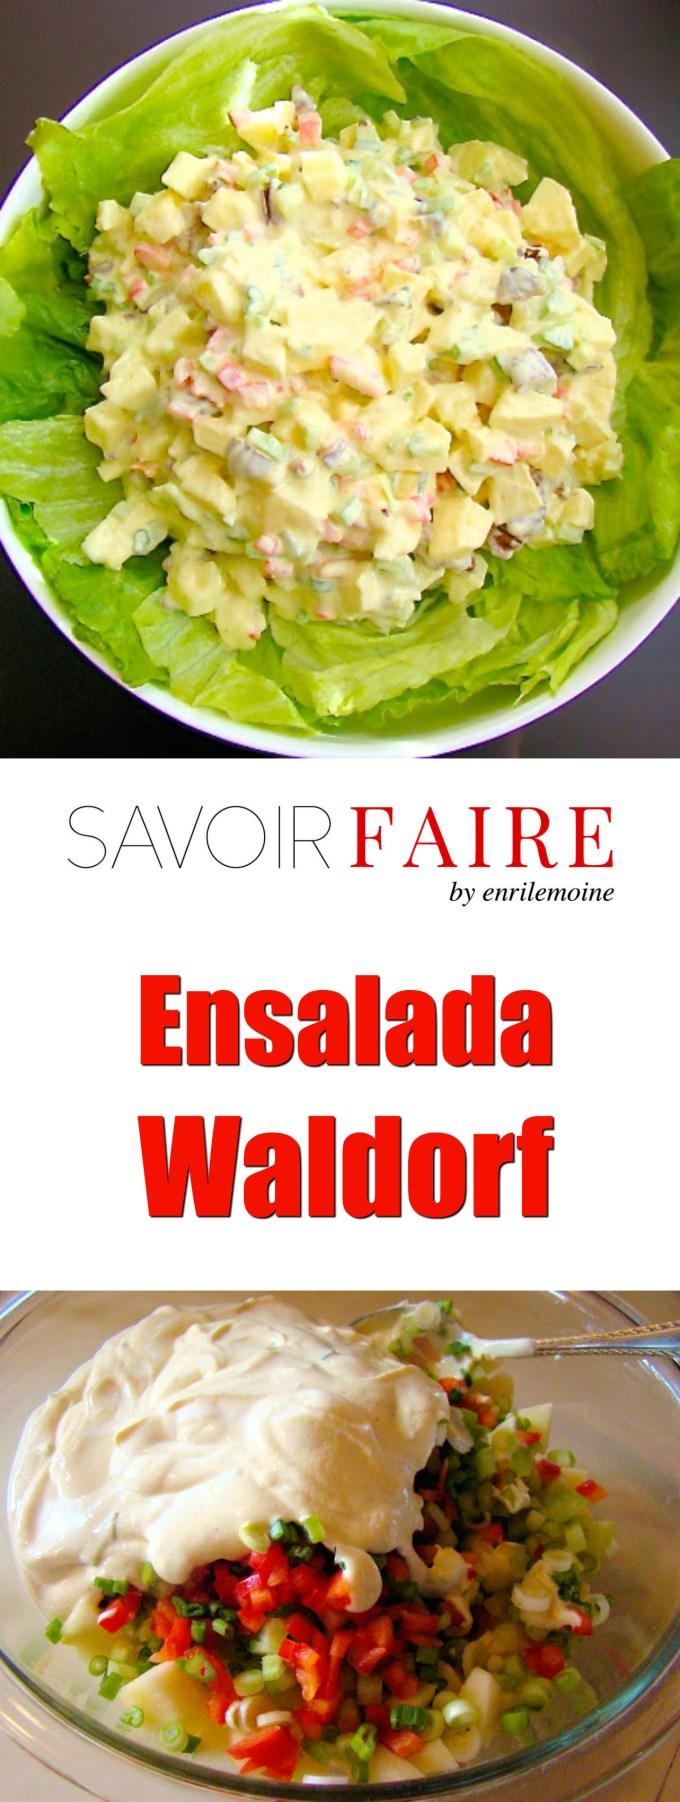 Ensalada Waldorf - SAVOIR FAIRE by enrilemoine